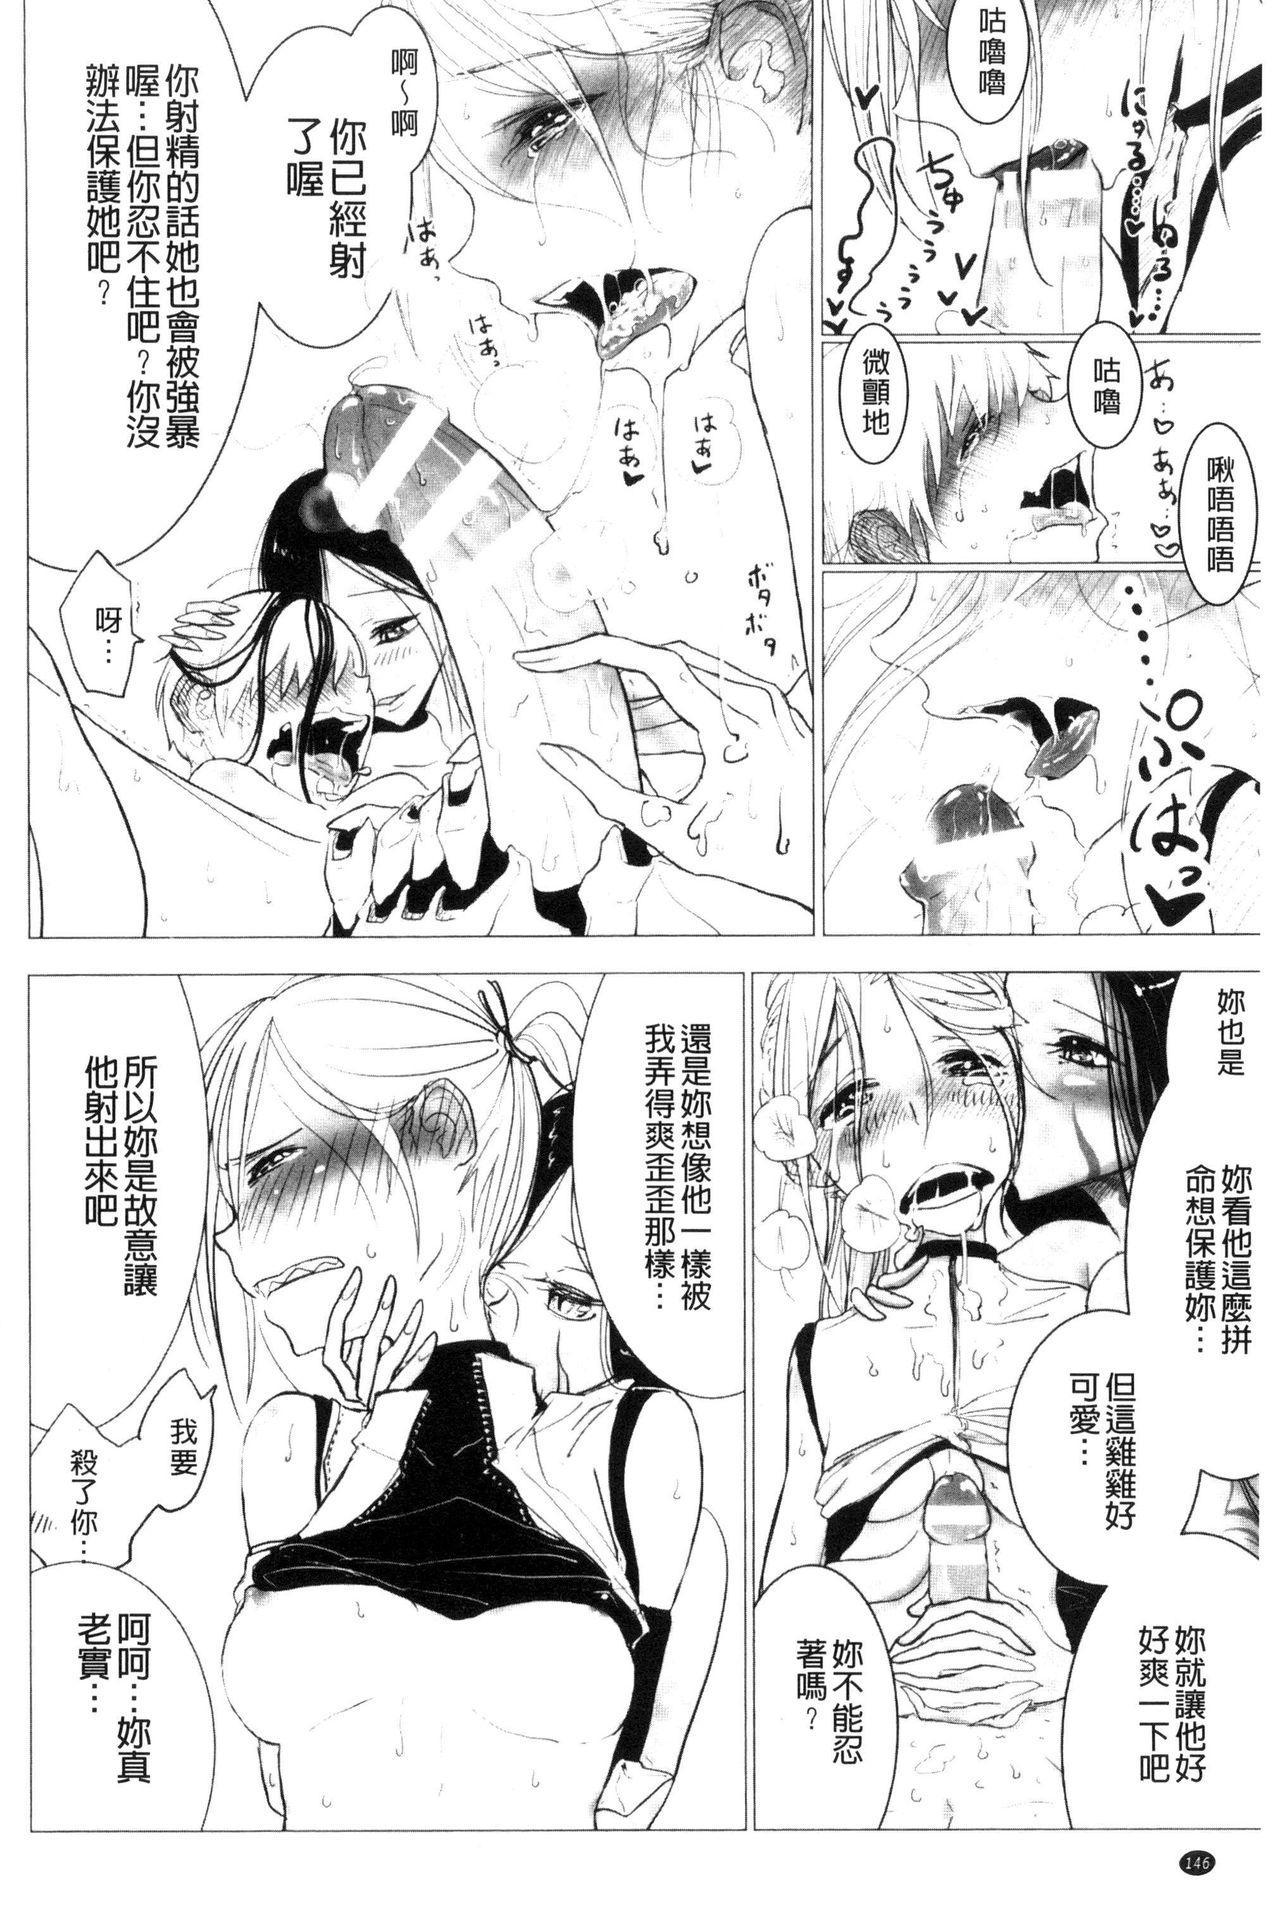 [Dhibi] Sono Yubisaki de Korogashite - Please Caress it at the Finger-tip. [Chinese] 147